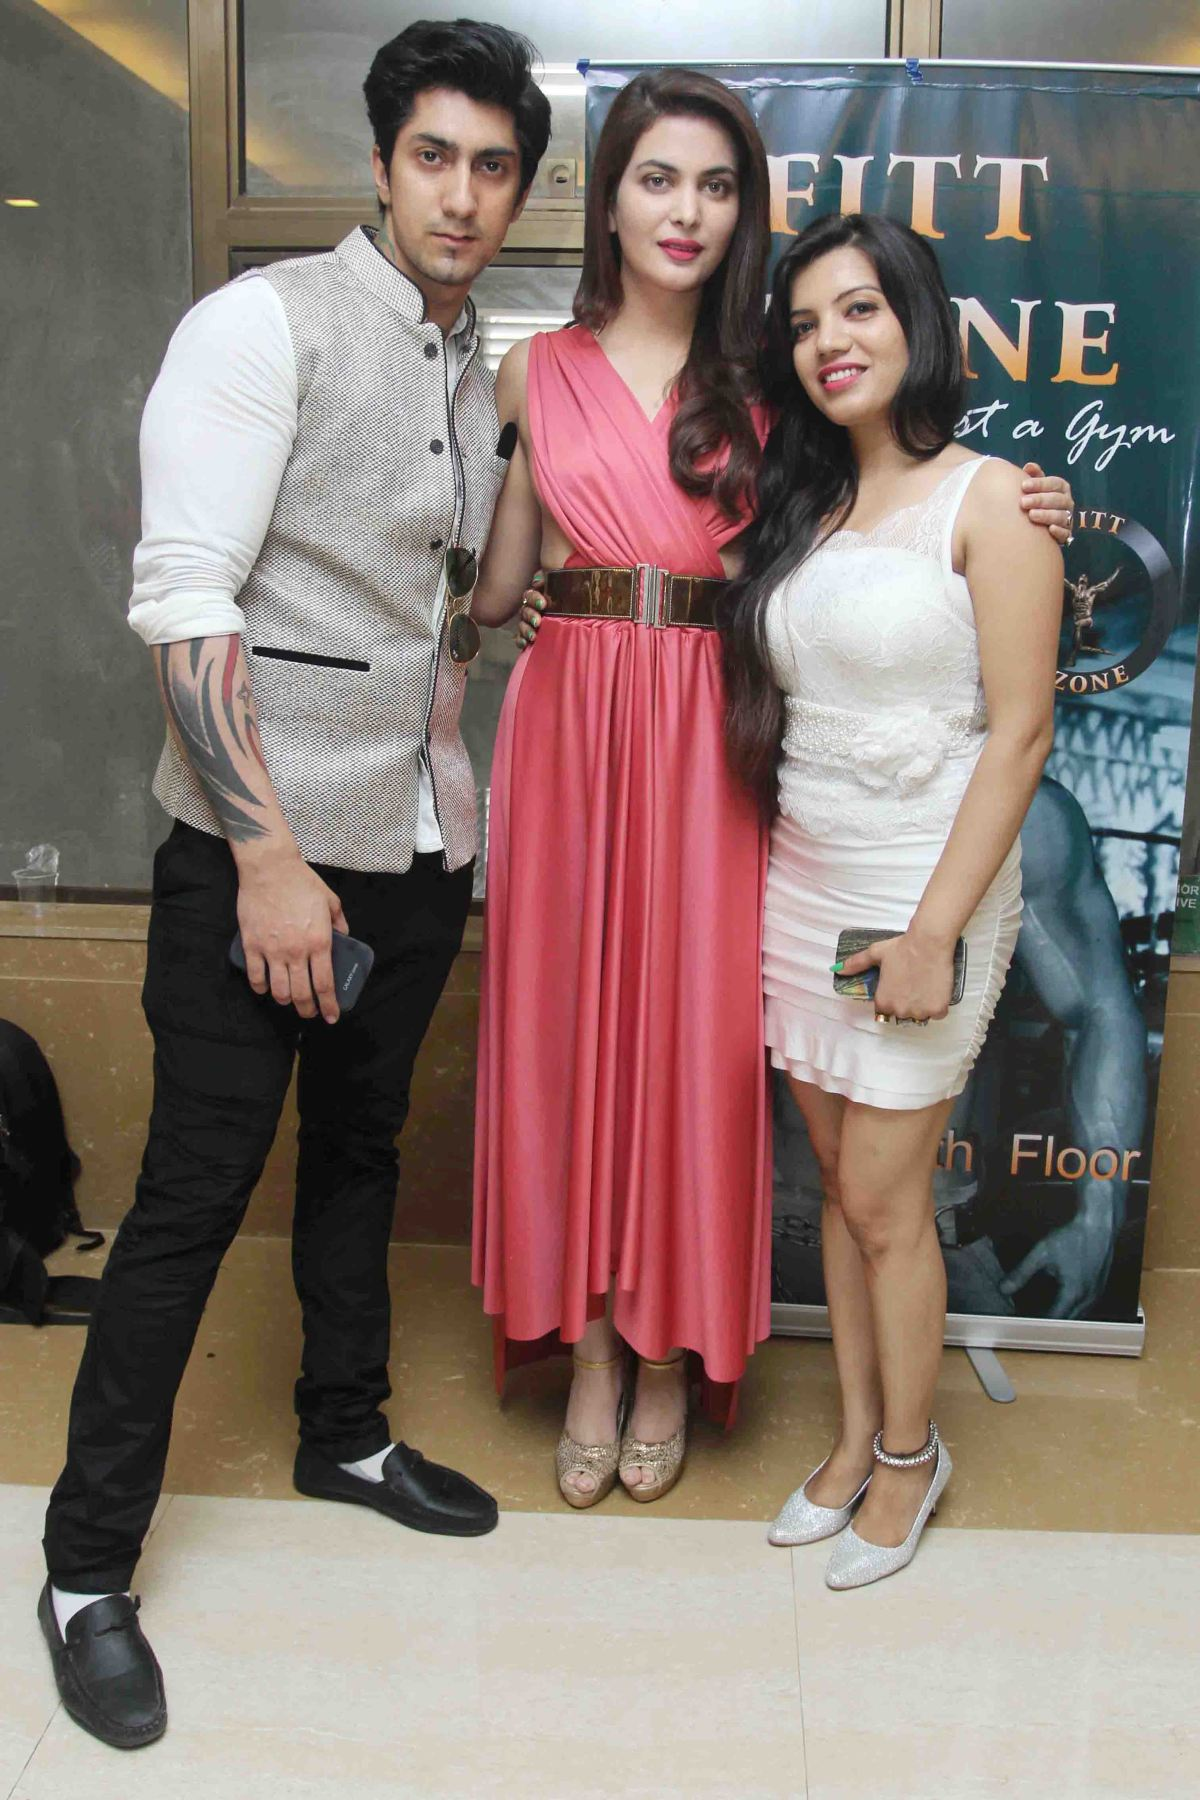 Karan Oberoi,Ankita Shorey & Monika